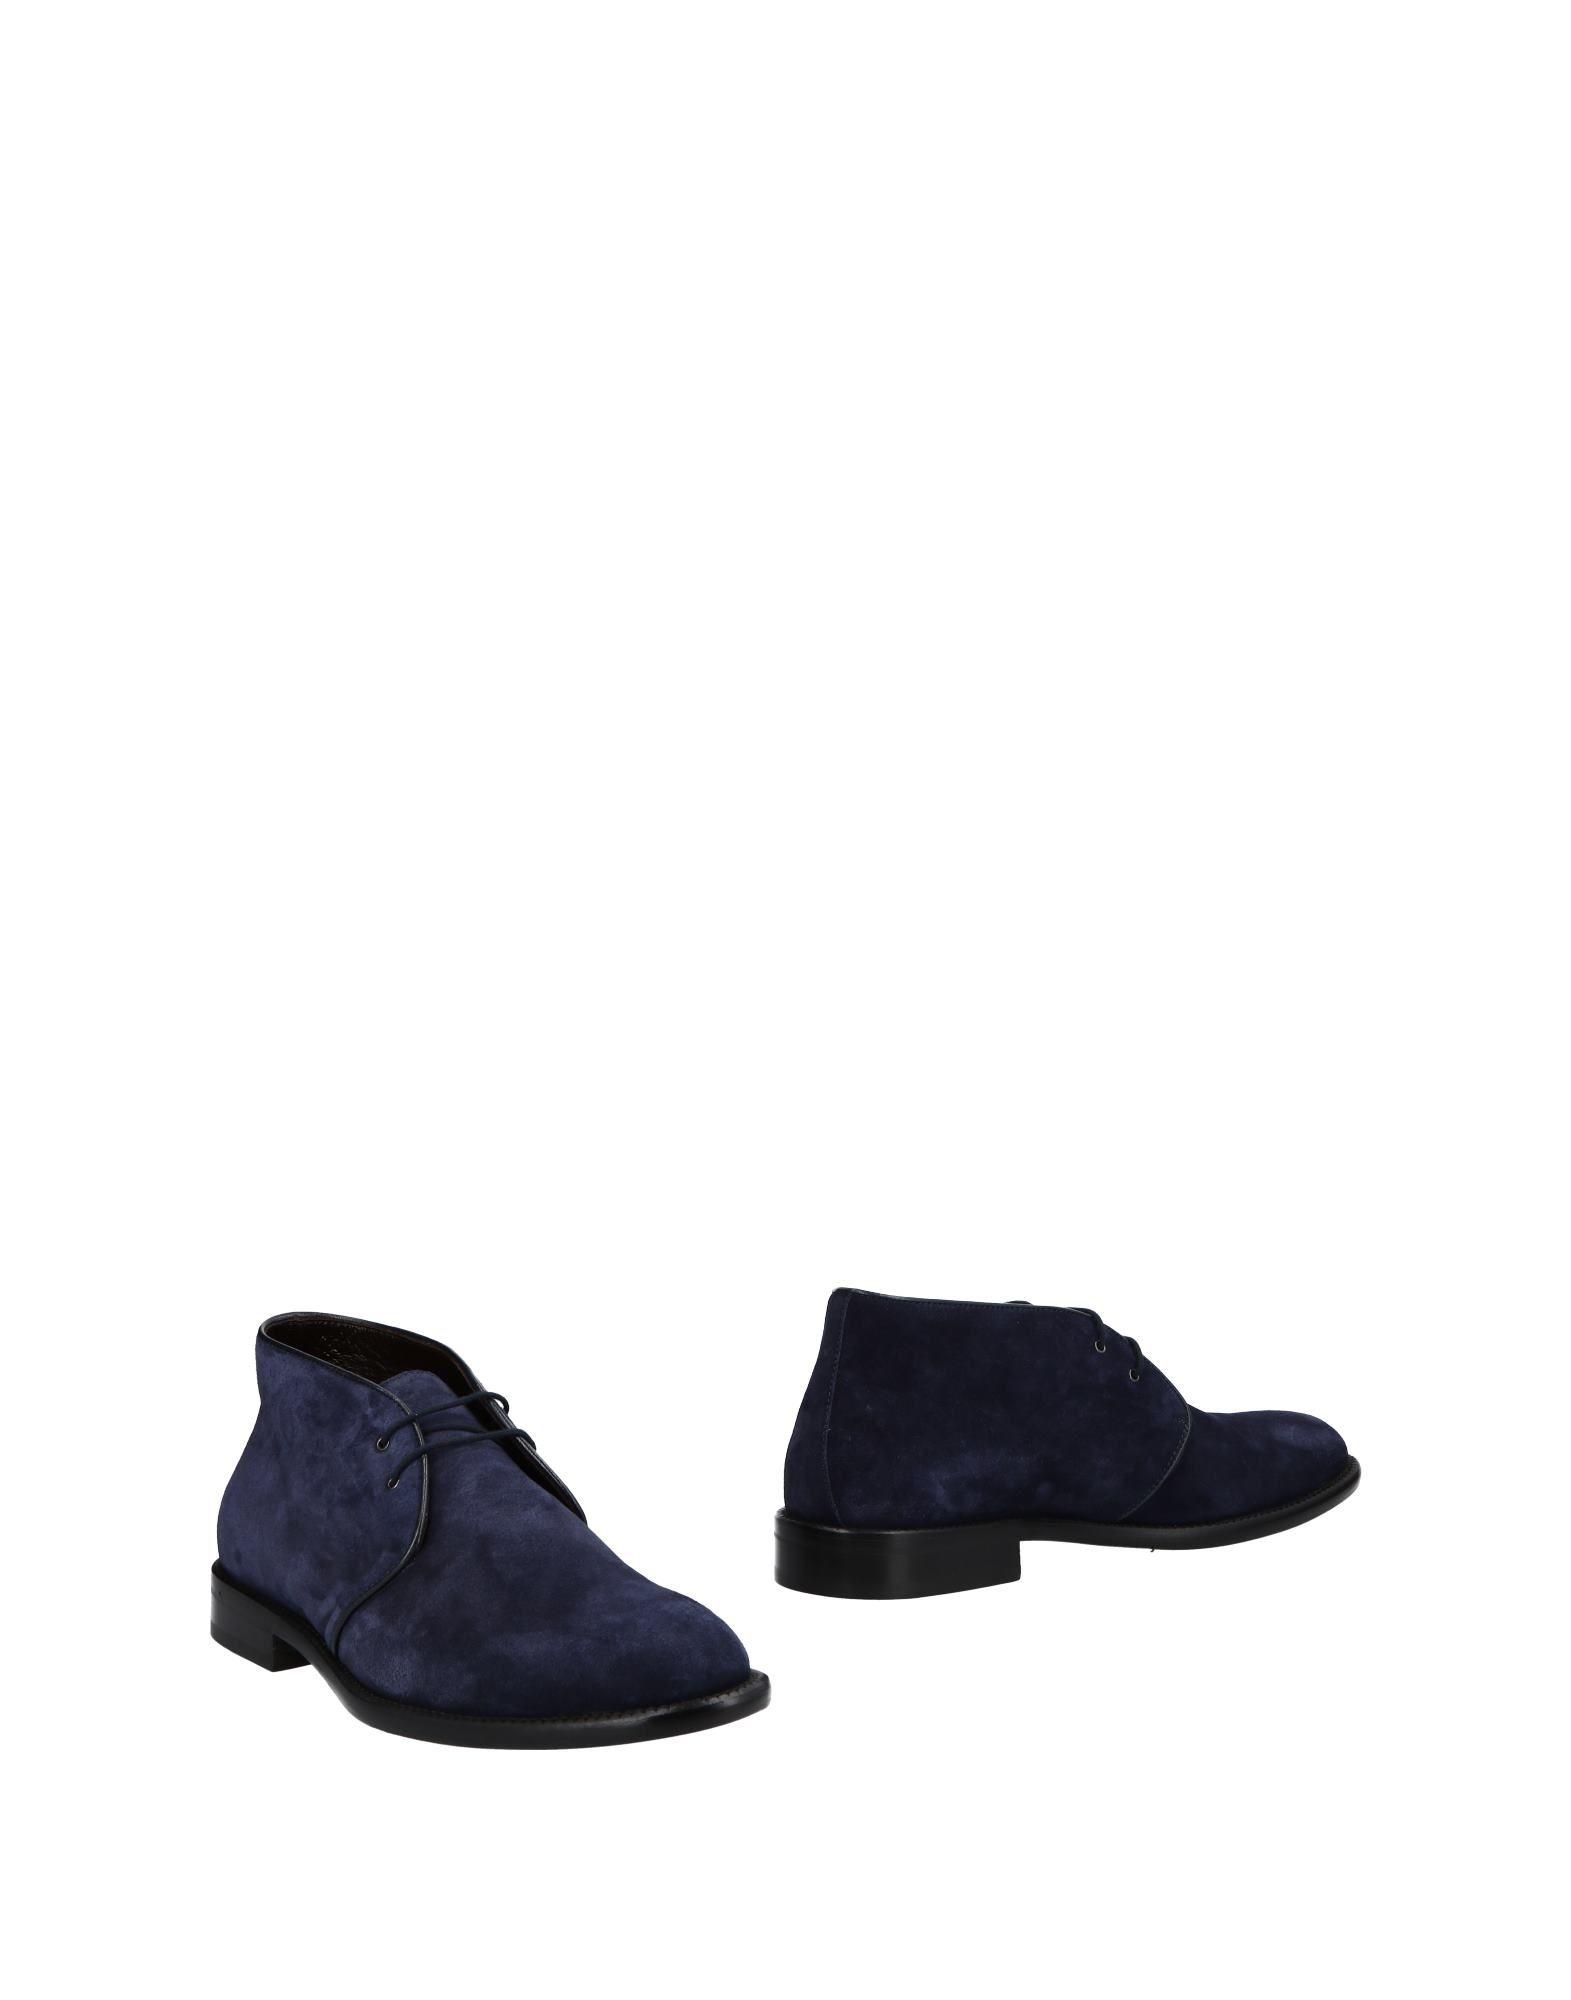 BRUNO MAGLI Полусапоги и высокие ботинки bruno magli полусапоги и высокие ботинки